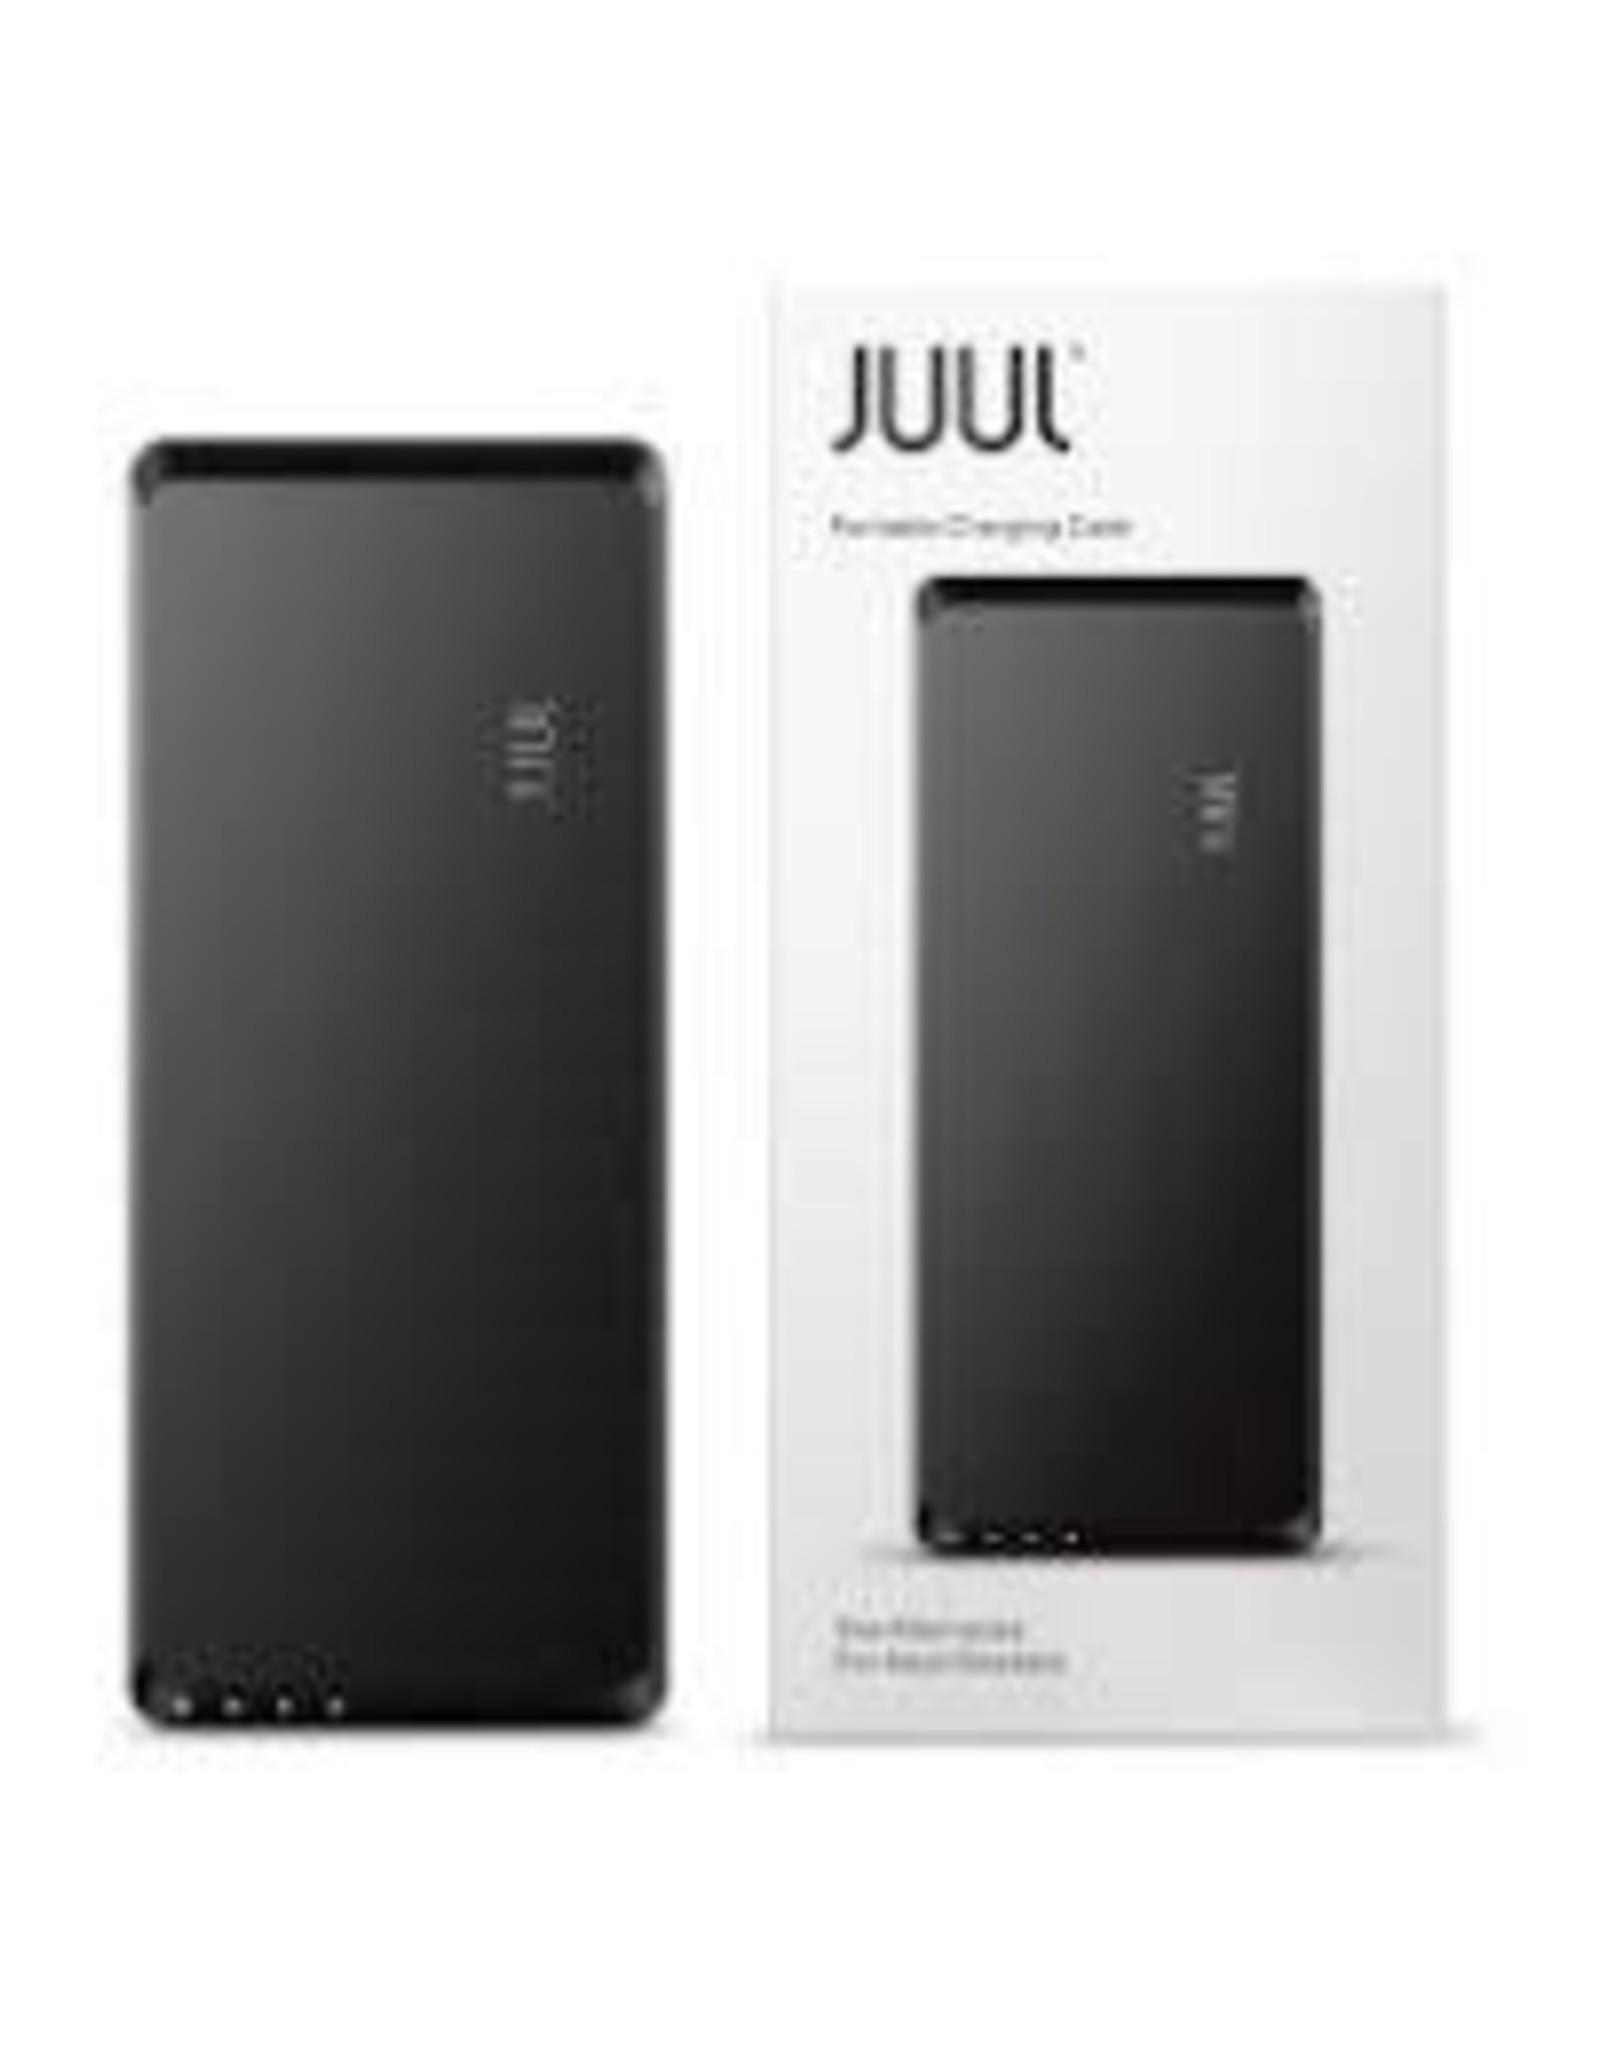 JUUL Juul charging case